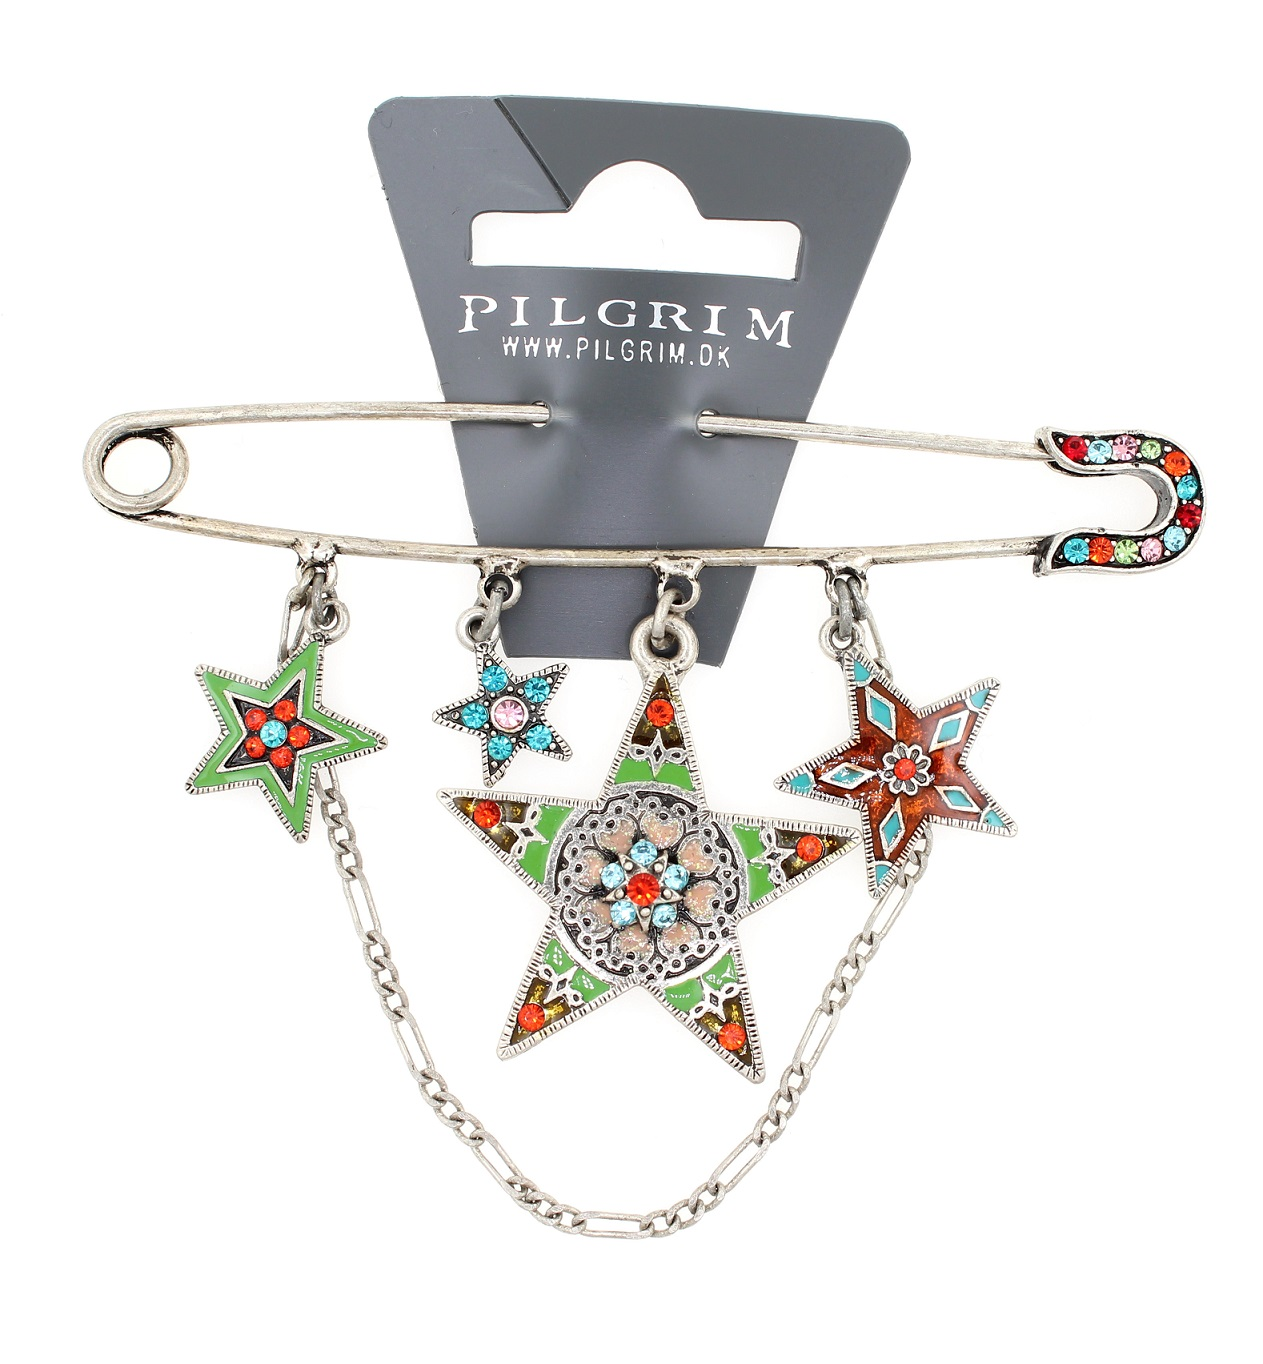 PILGRIM - STARS - Kilt Pin Brooch - Silver/Multi Swarovski BNWT